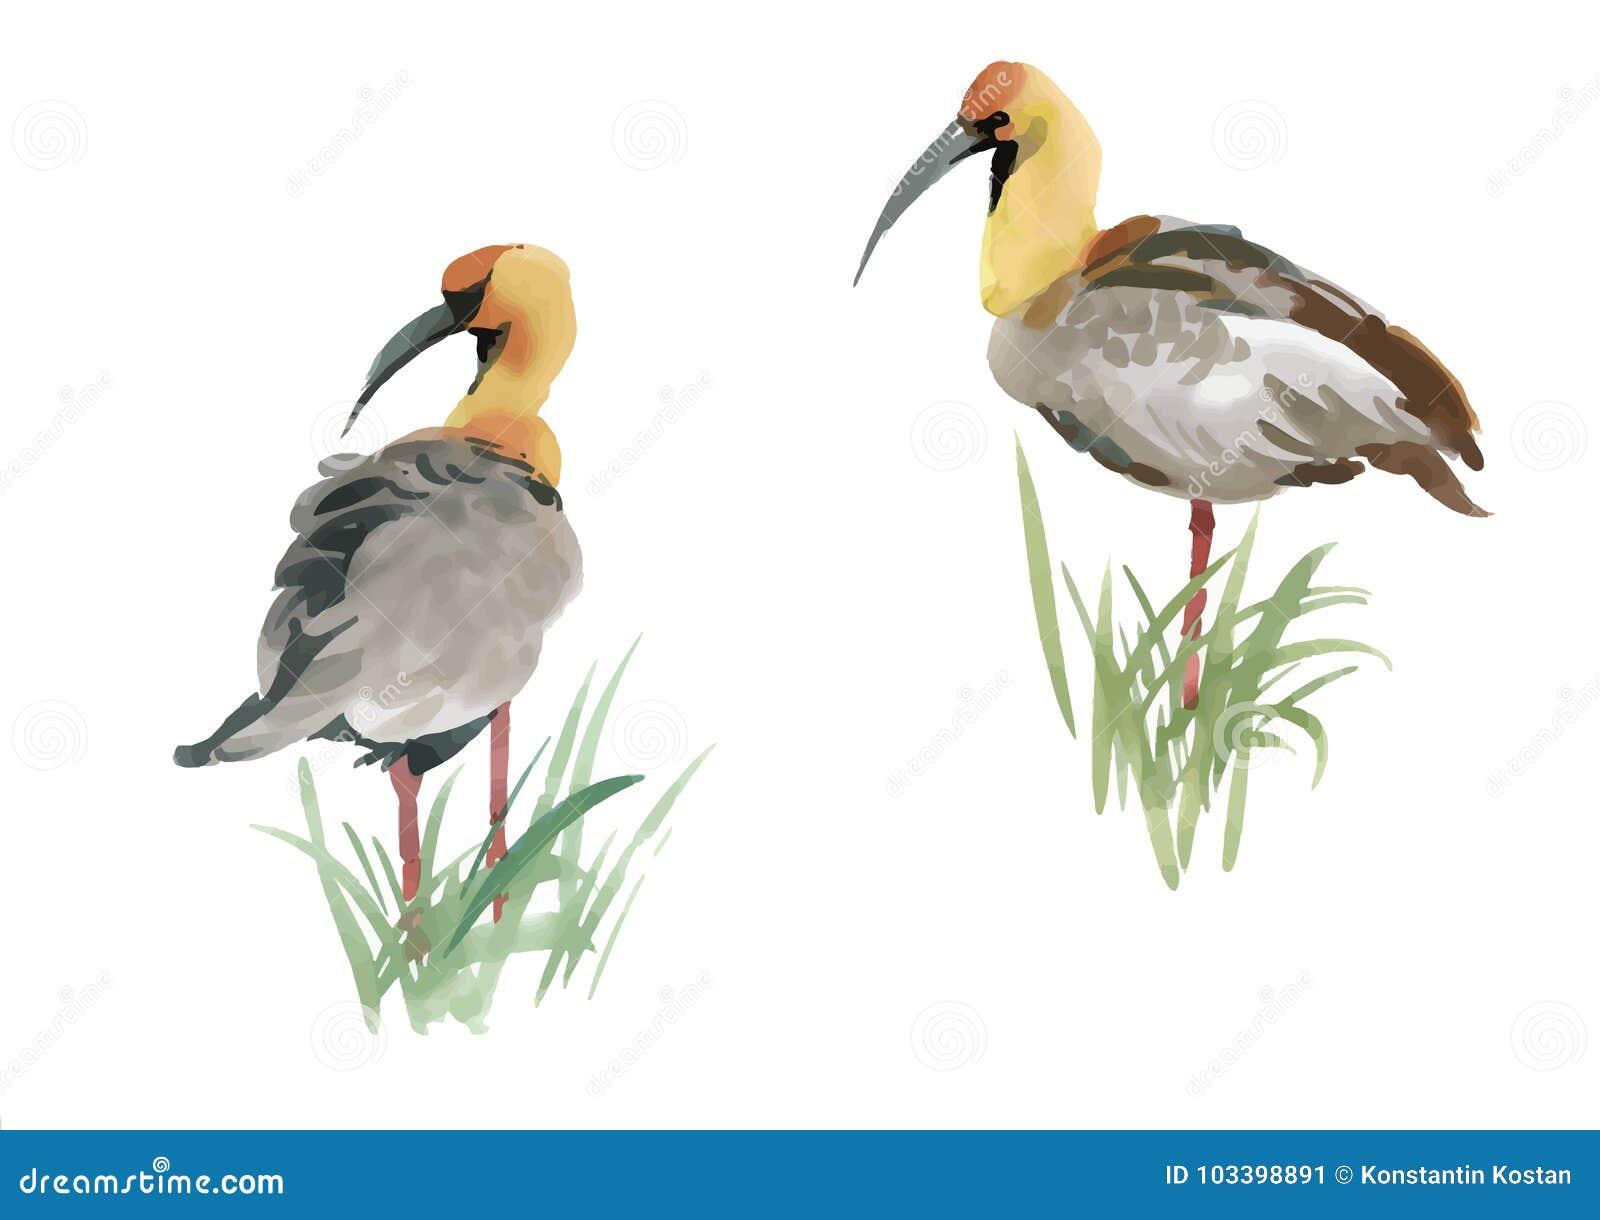 beautiful hand drawn grey birds in grass on white background rh dreamstime com